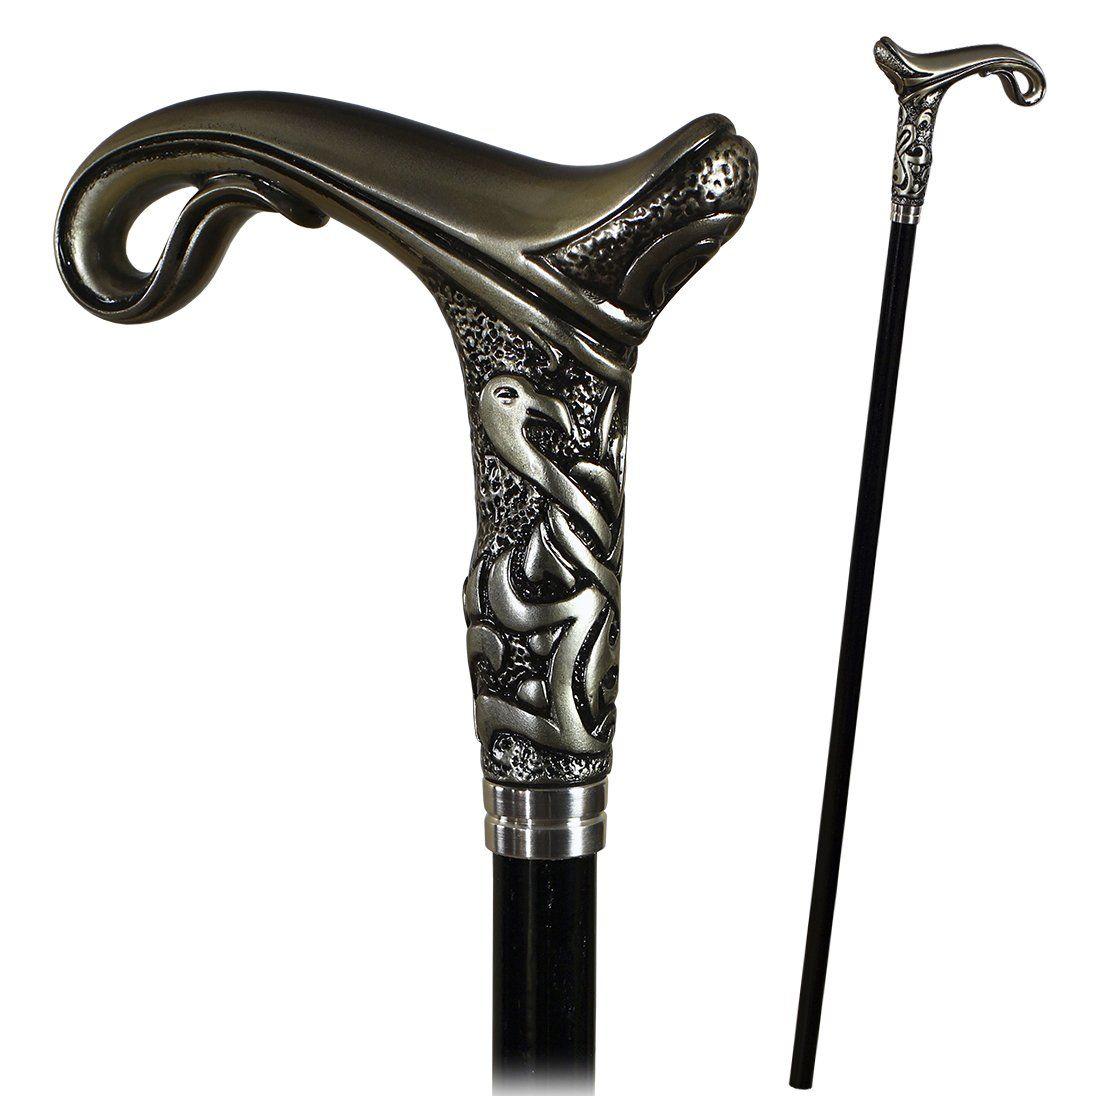 Designers Handmade Walking Cane Stick Magic#2 Light Bone Color Art Stone Handle